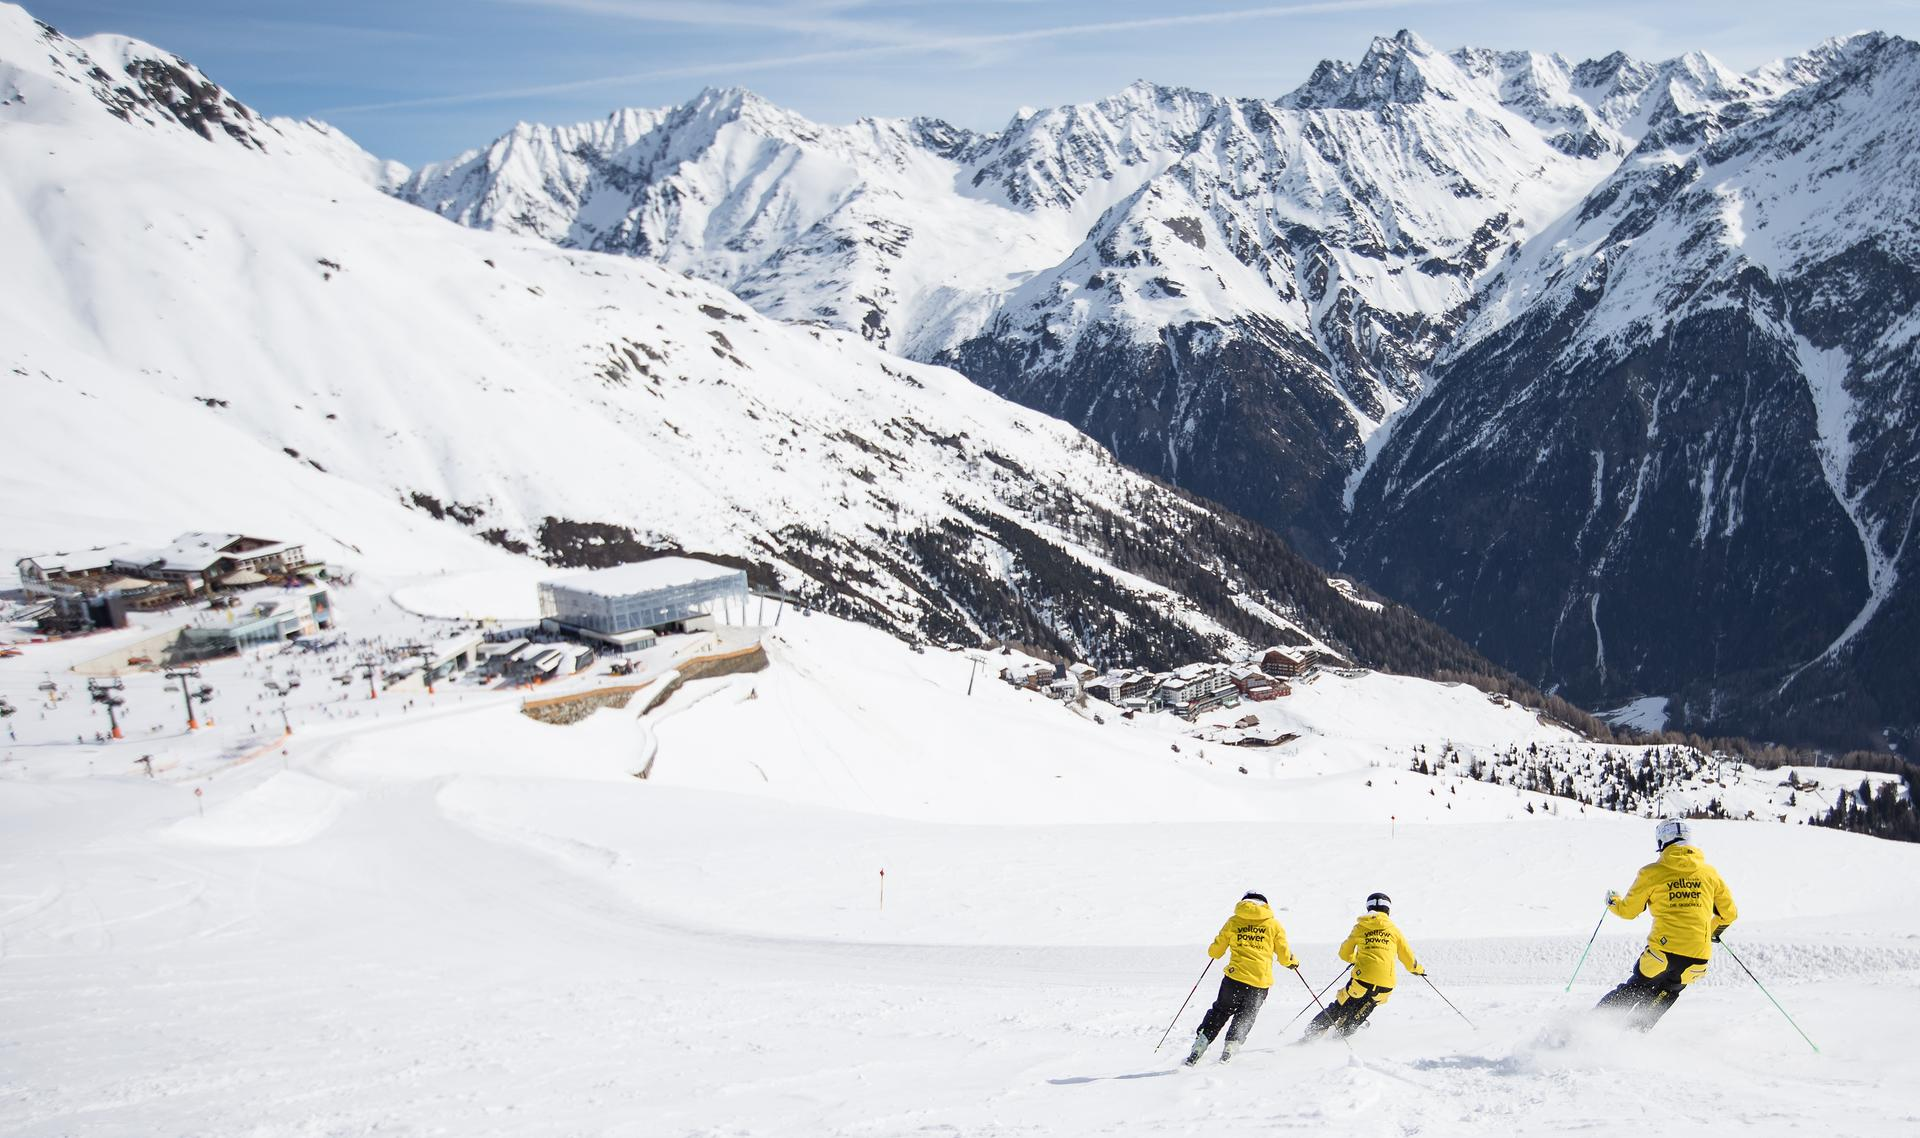 Ski resort Slden: private rooms Slden - BERGFEX